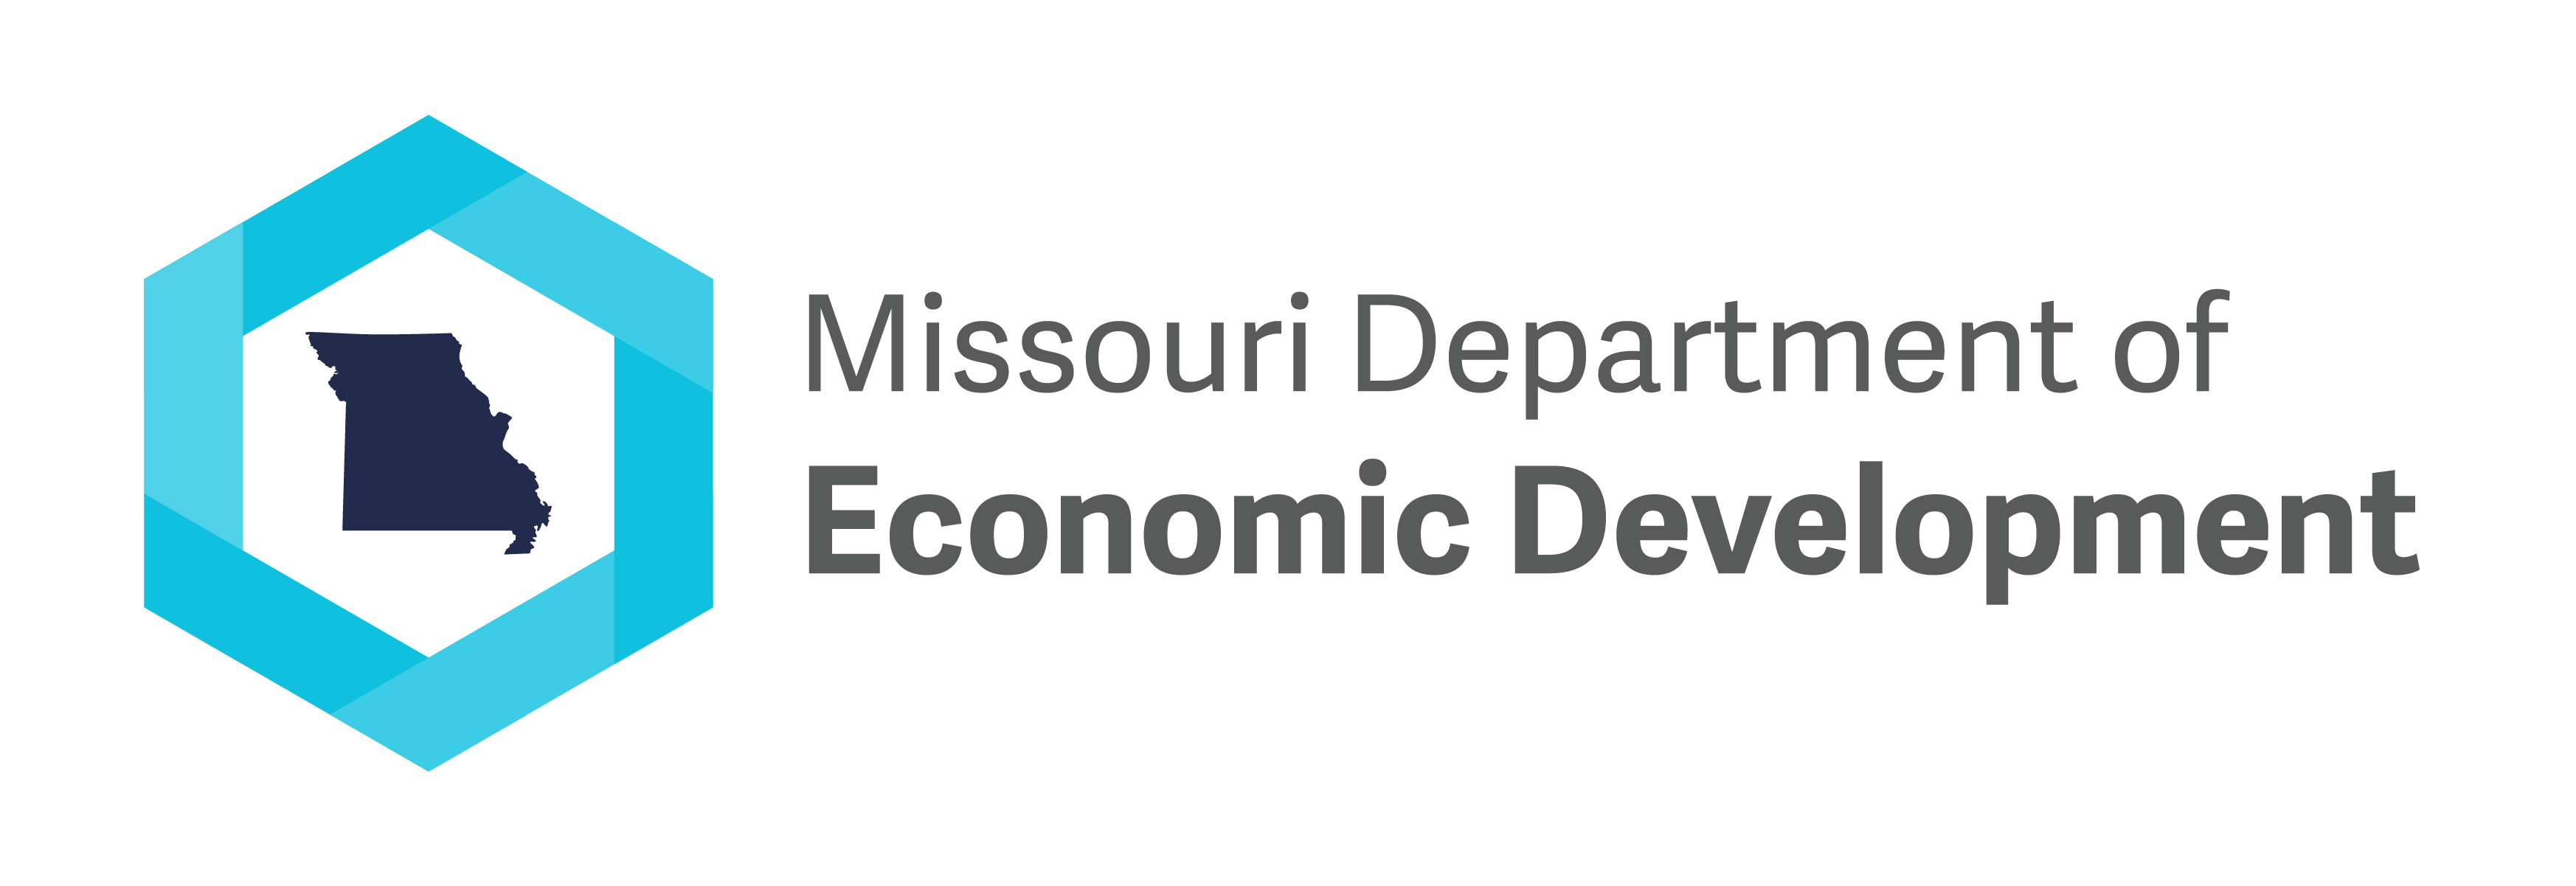 Missouri Department of Economic Development Logo